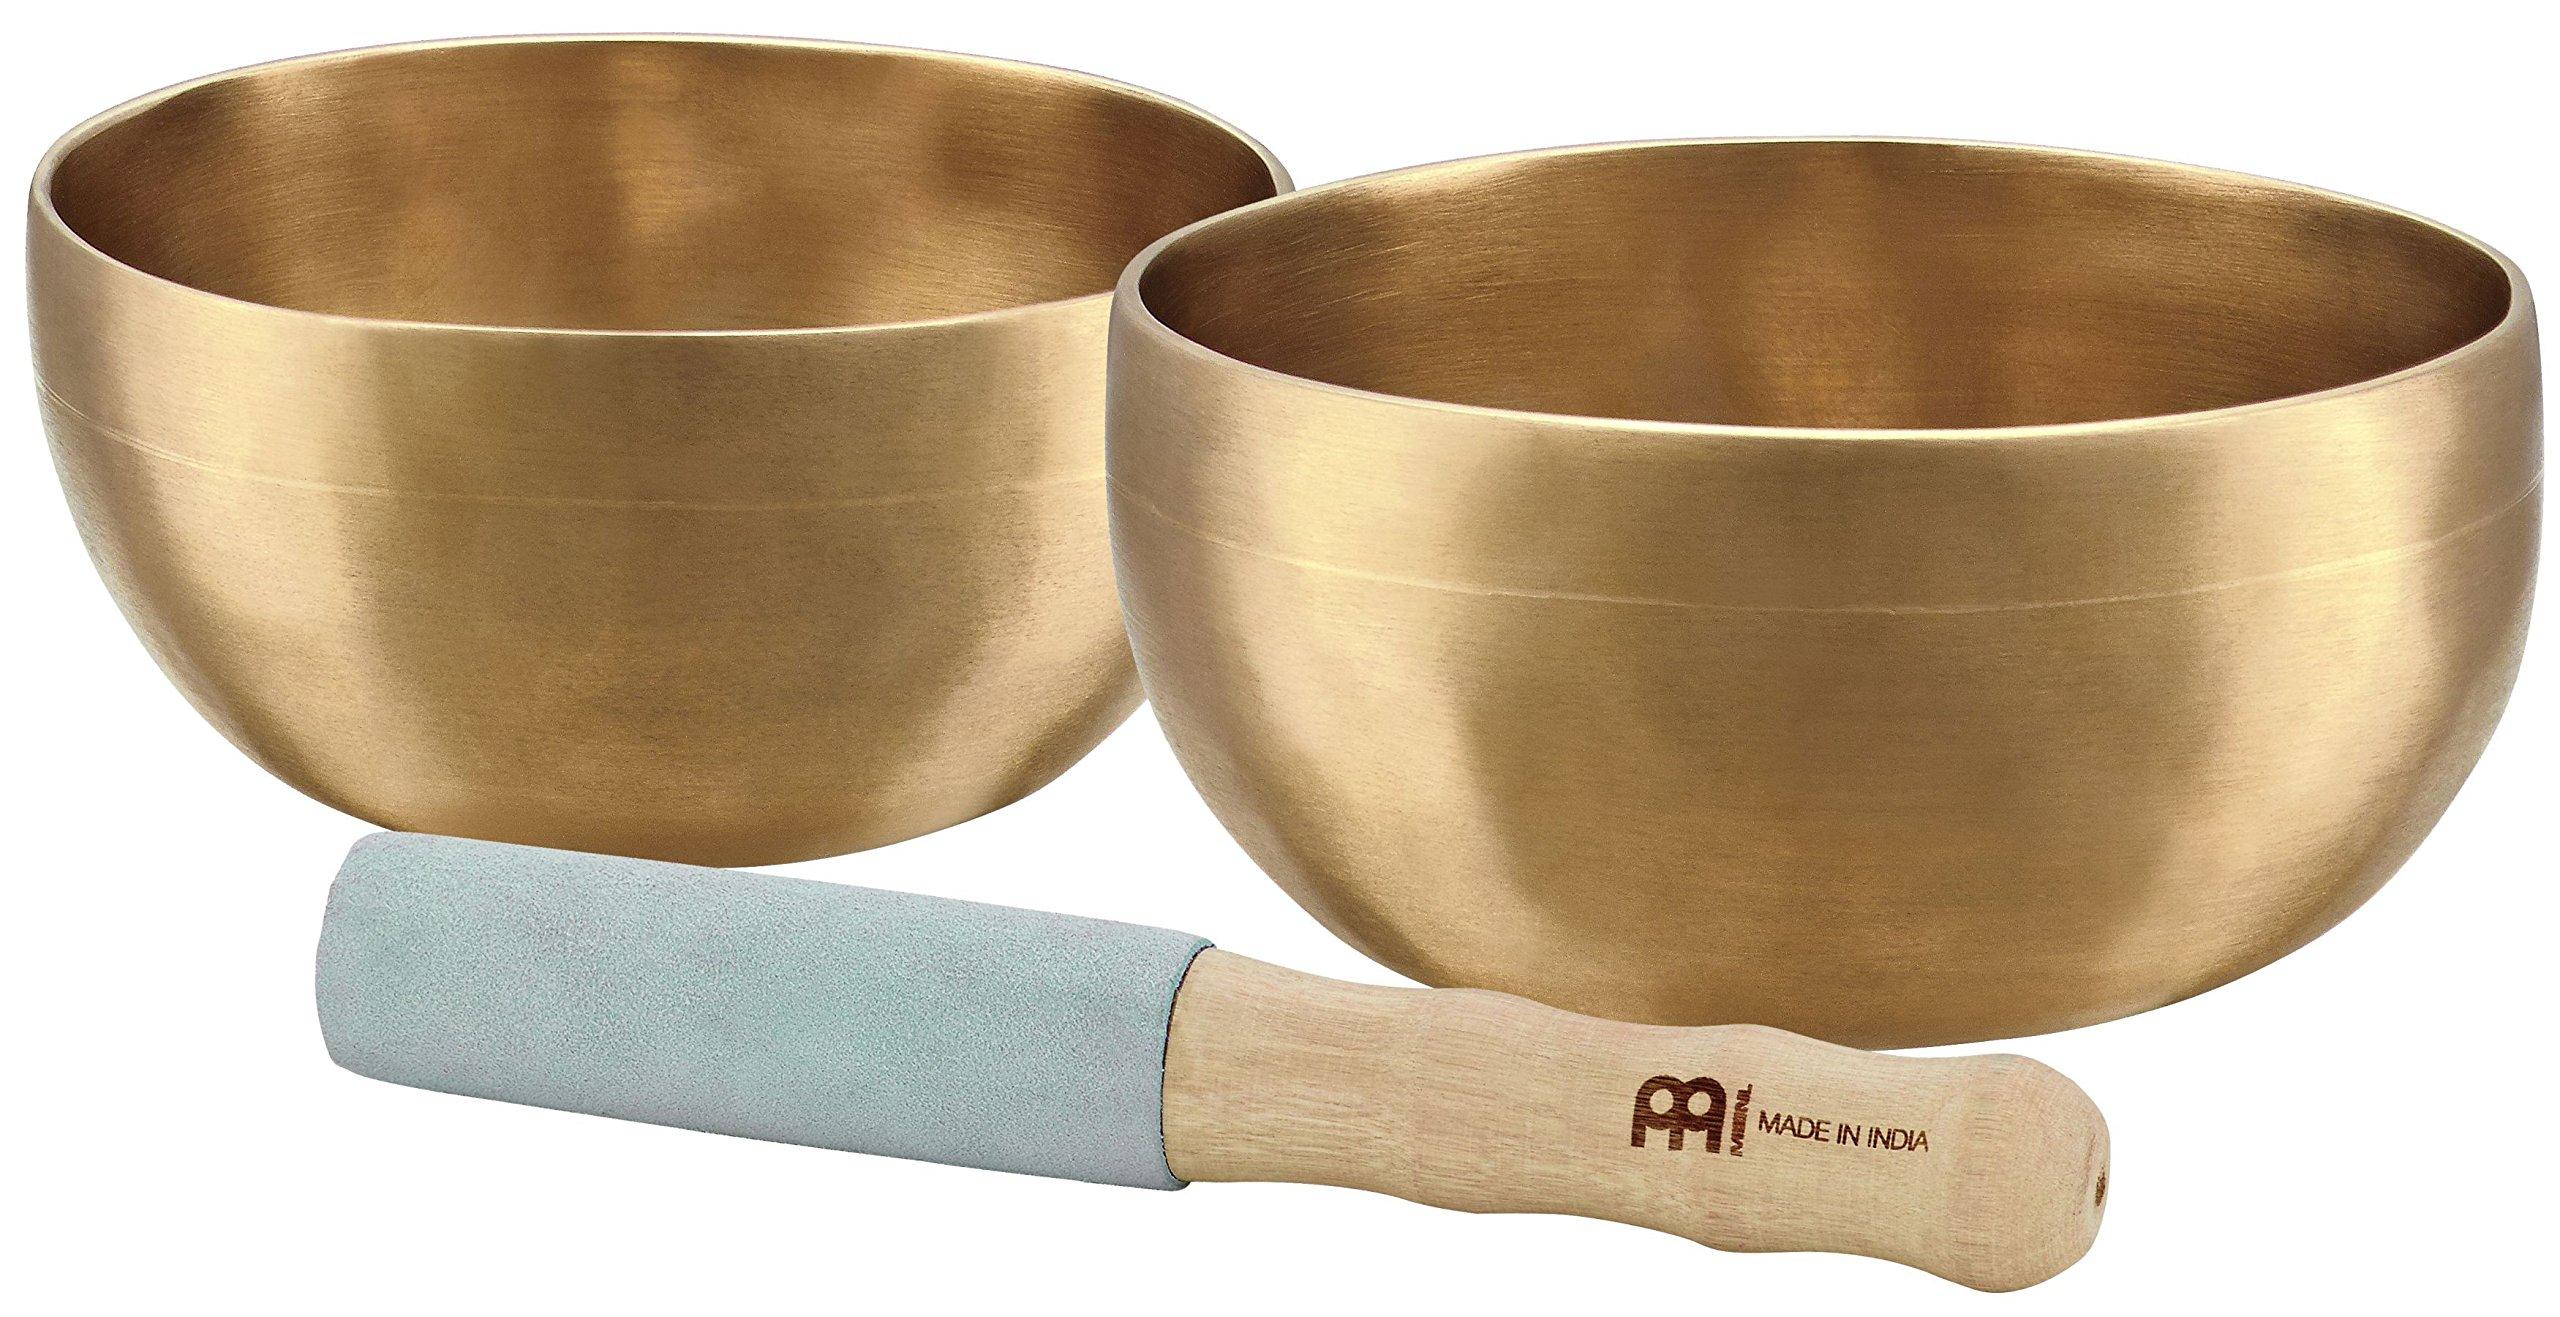 Meinl Sonic Energy SB-U-900 2-piece Universal Singing Bowl Set with Resonant Mallet